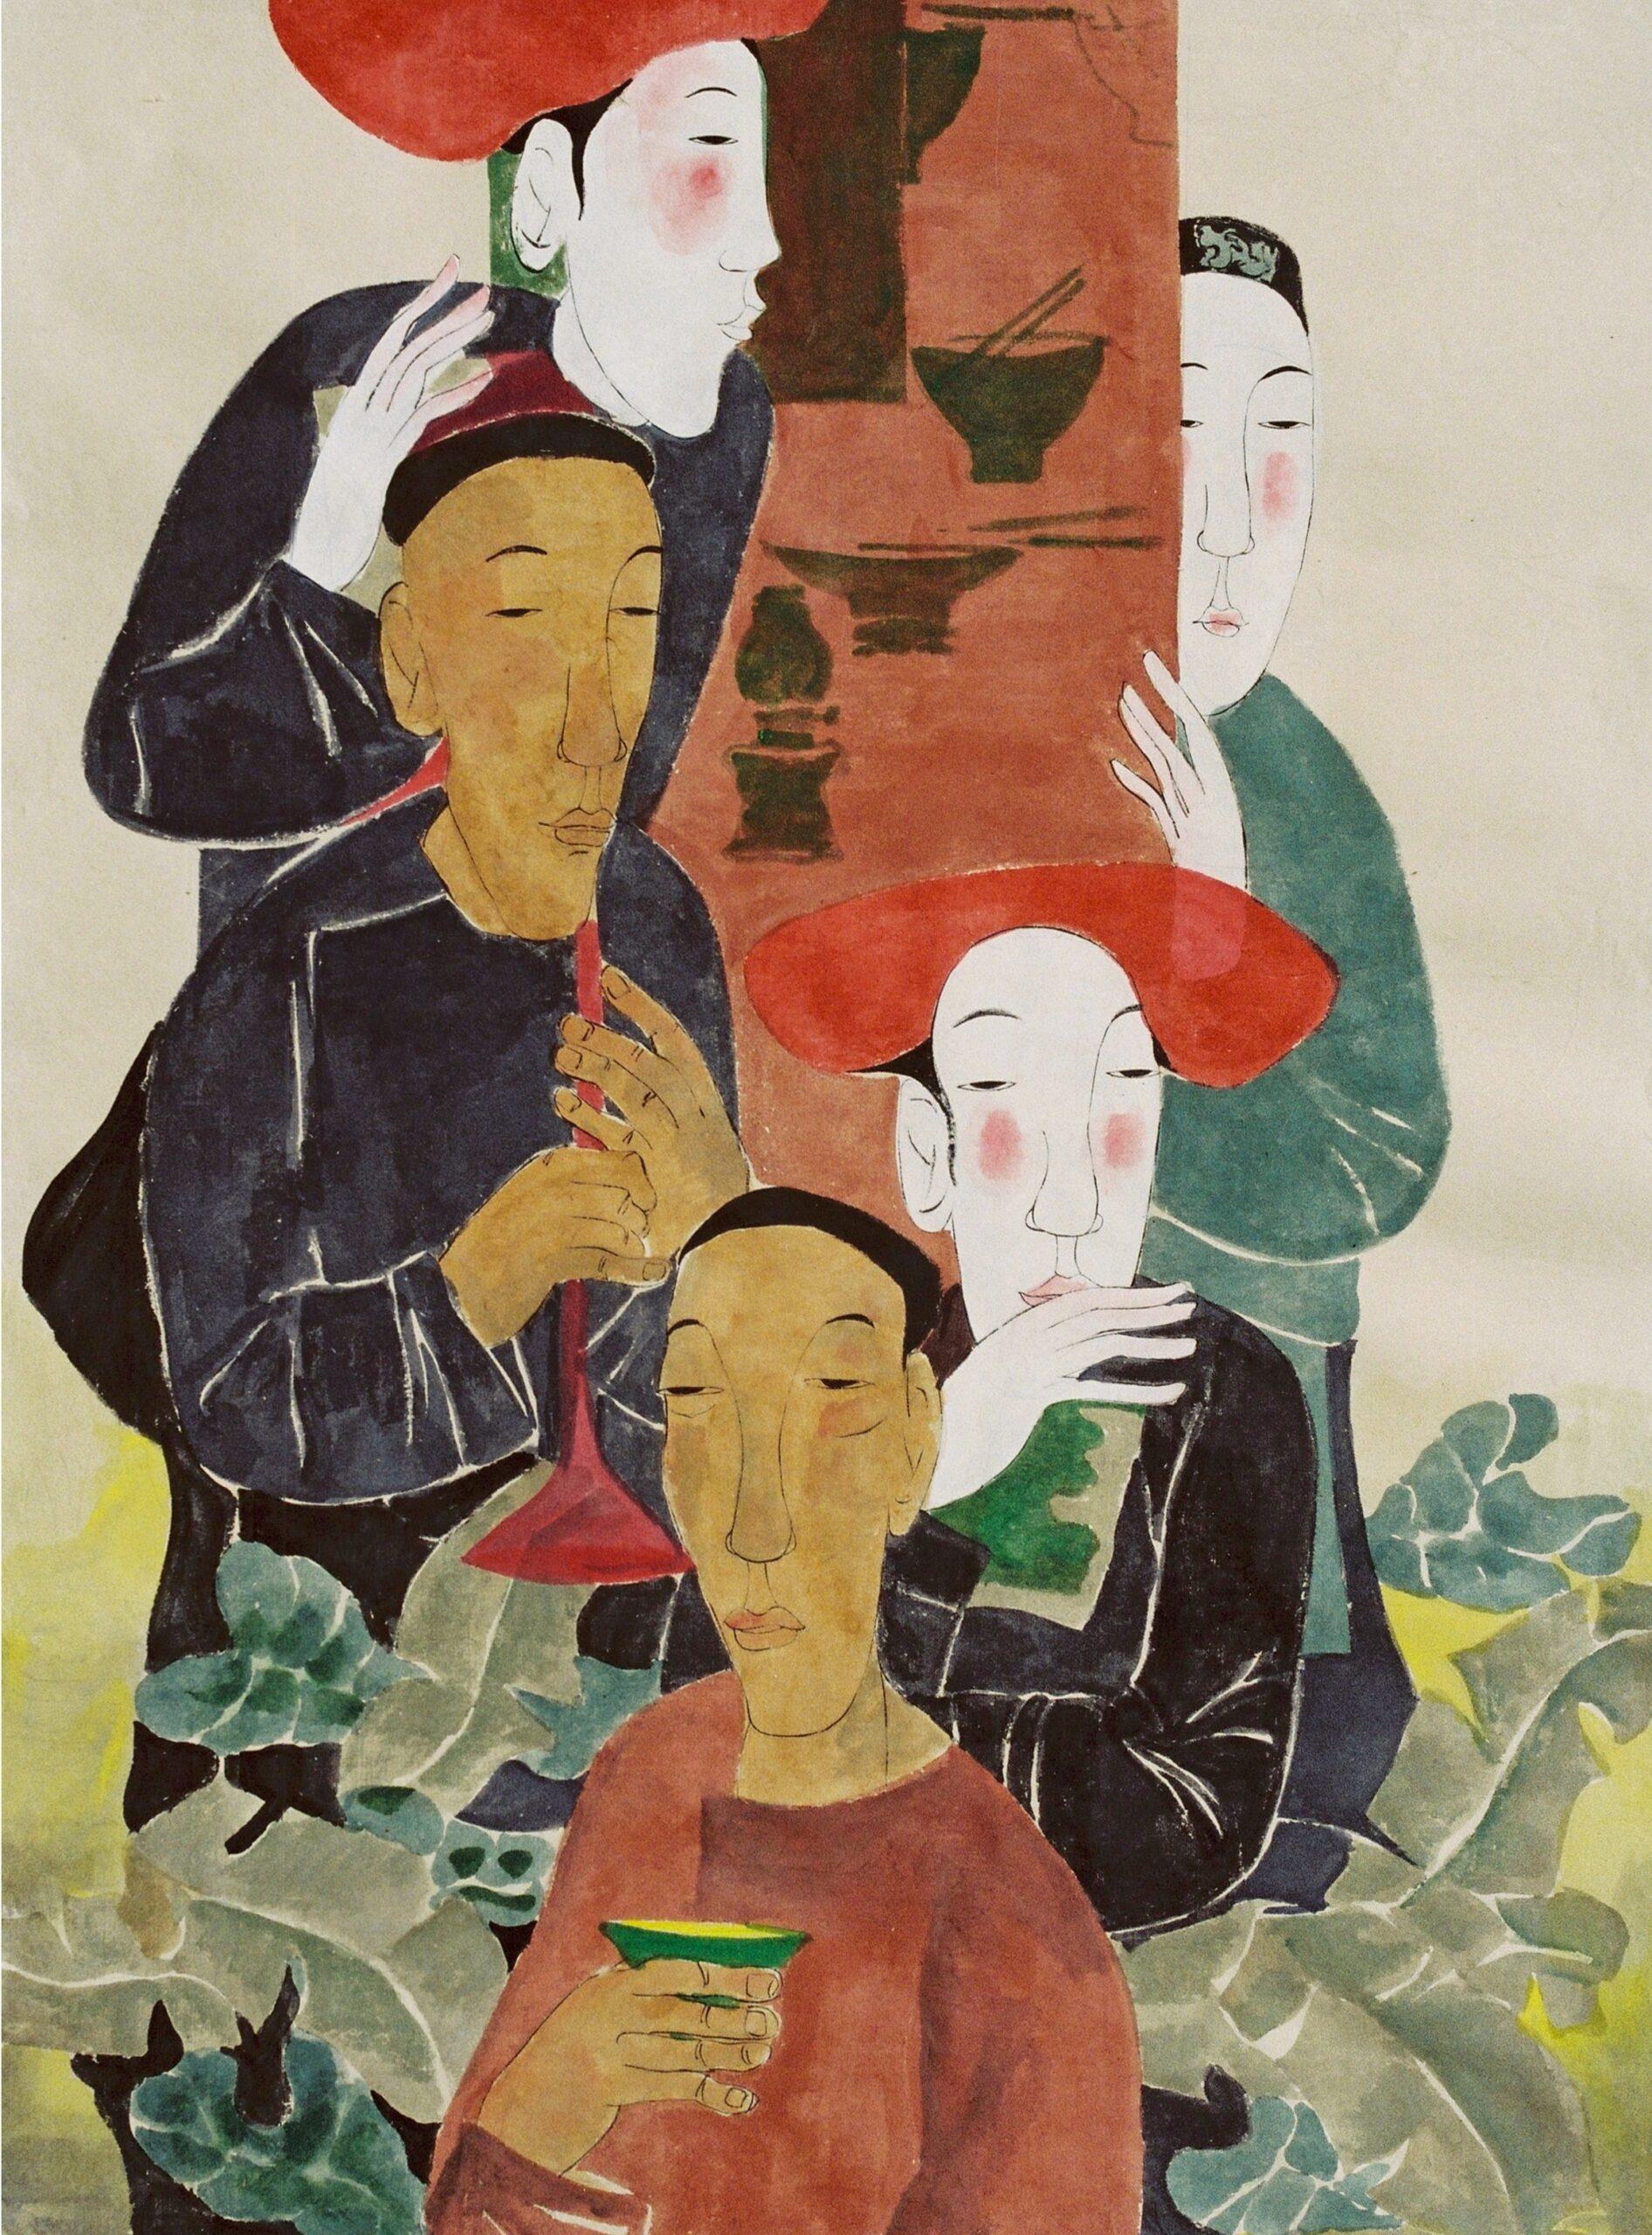 Elixir and Incense by Vu Thu Hien, watercolour on handmade paper, 2008, 110 x 80 cm